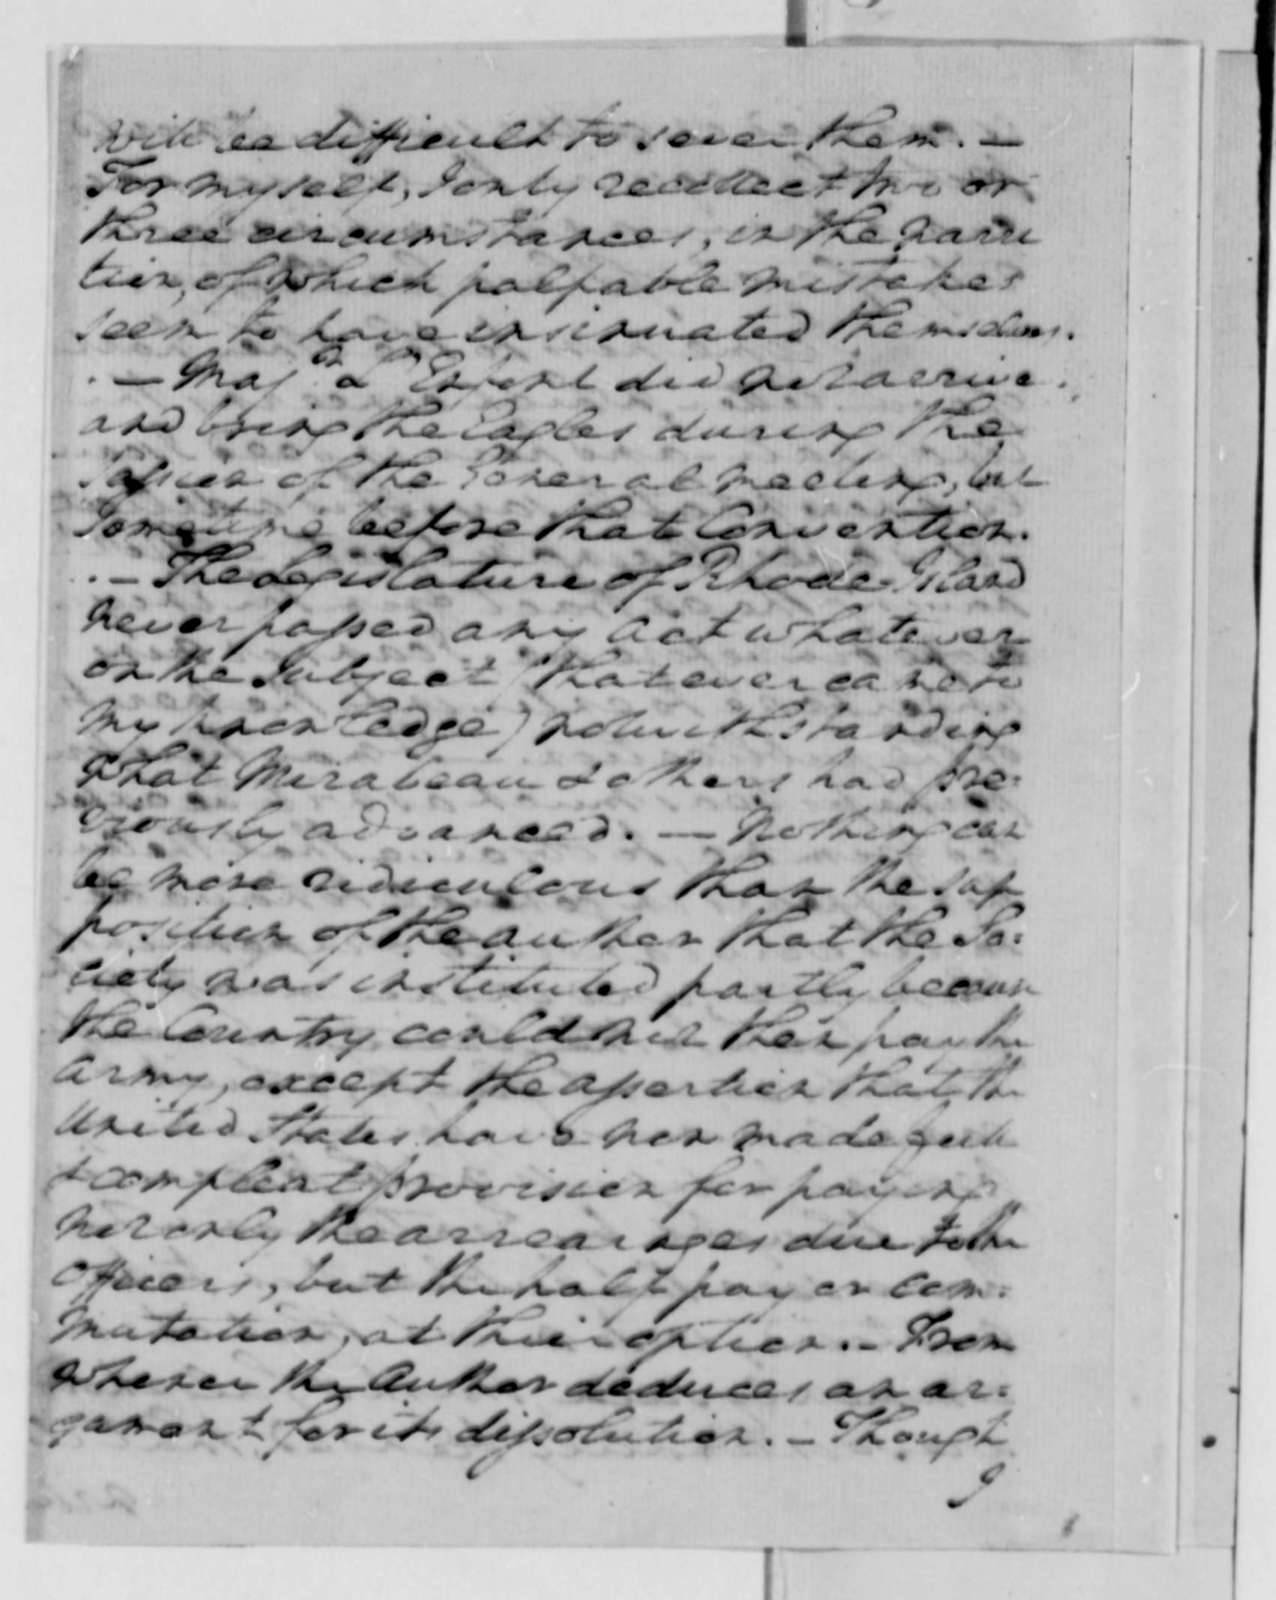 George Washington to Thomas Jefferson, May 30, 1787